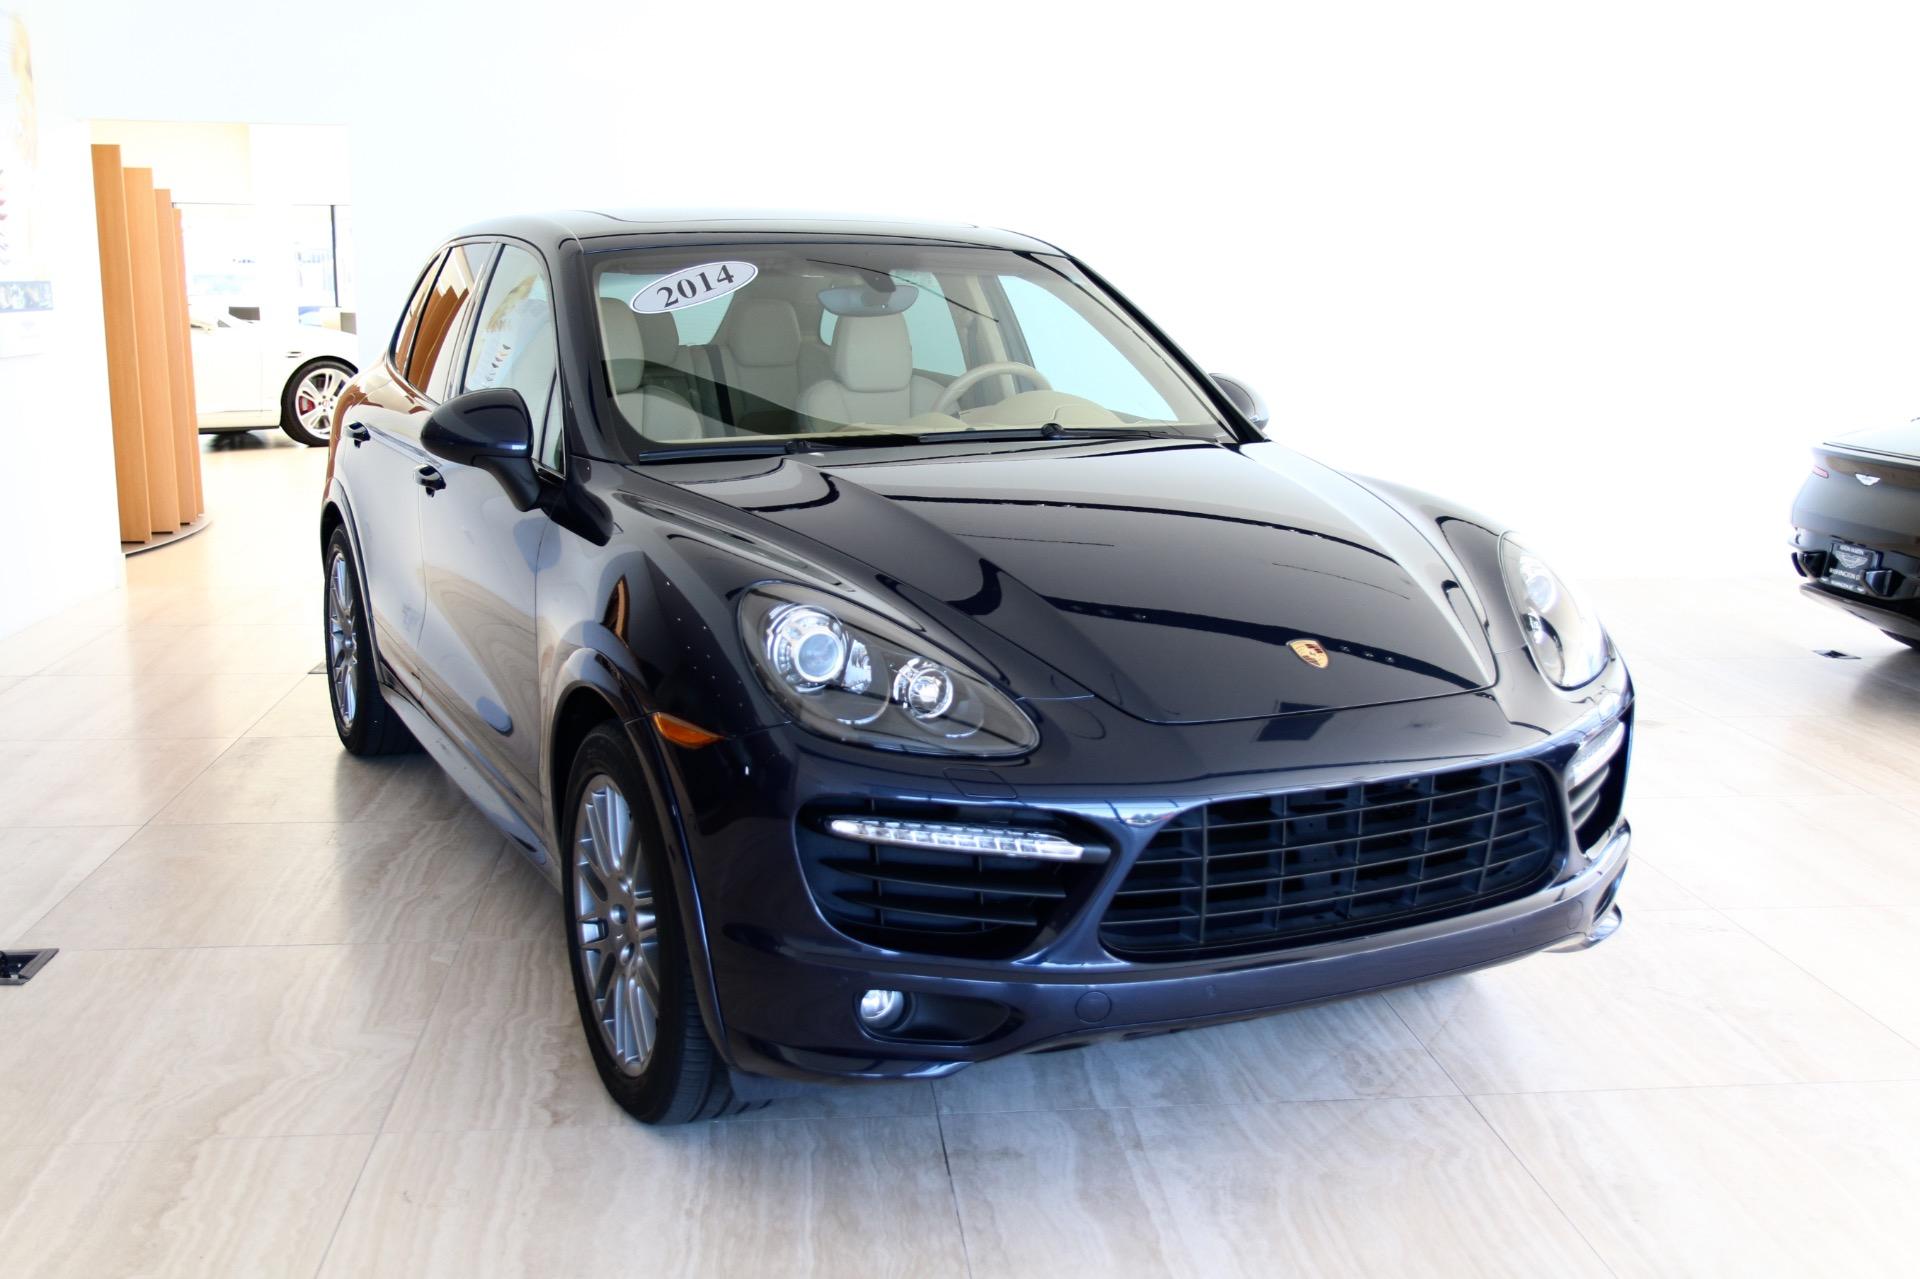 2014 Porsche Cayenne Gts Stock Pa73062 For Sale Near